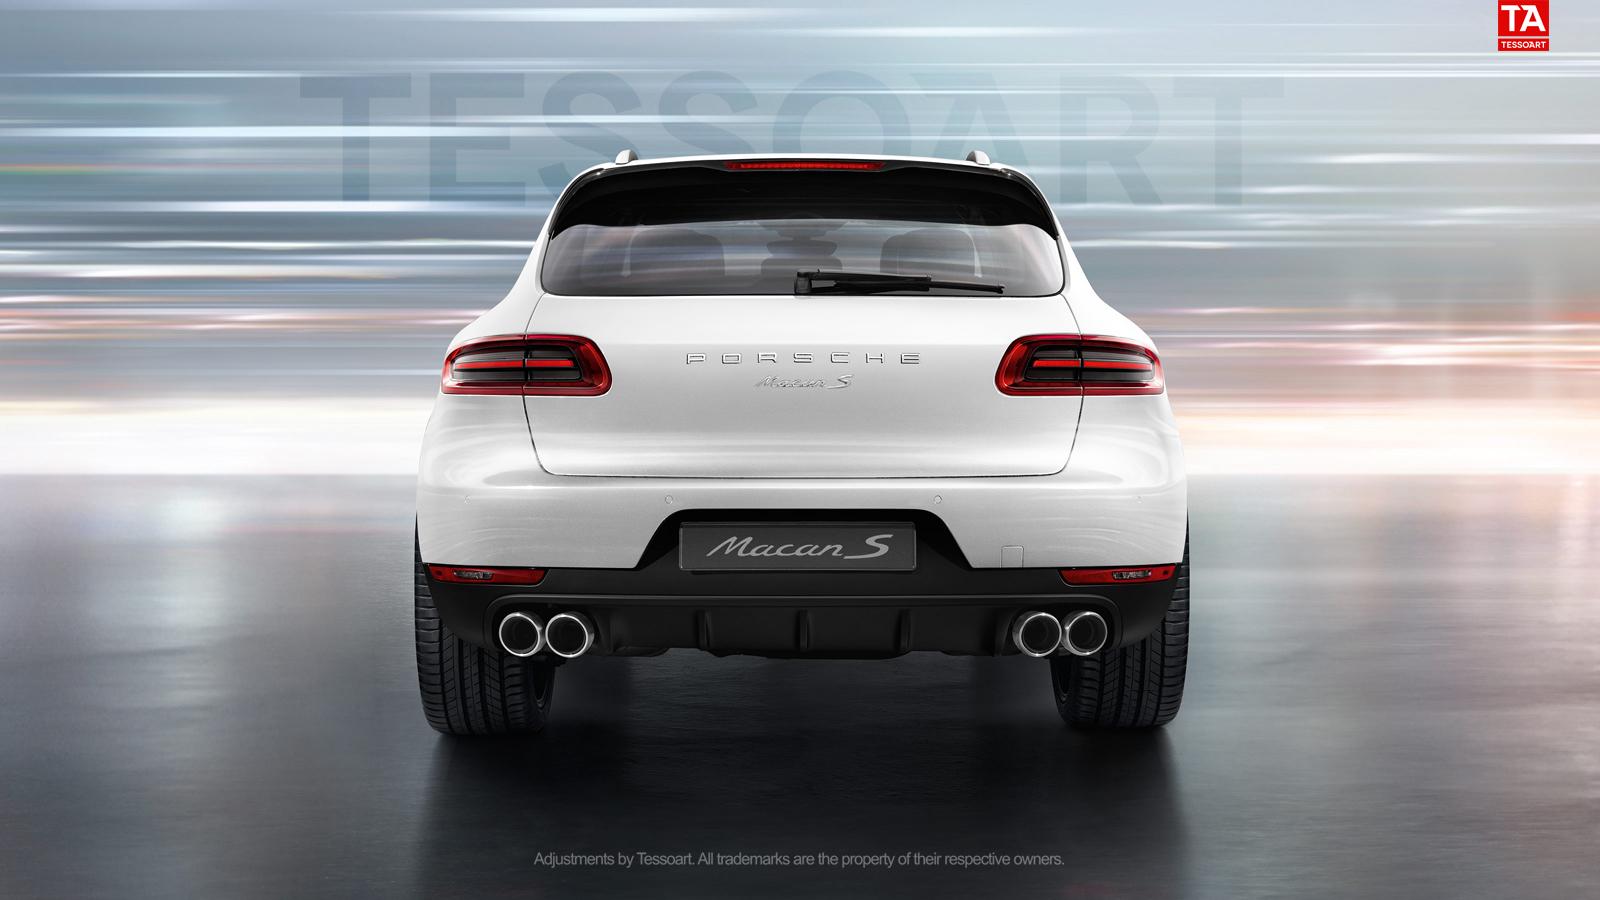 Porsche Macan Forum >> [RENDER] Porsche Macan S in white with SportDesign wheels - Teamspeed.com